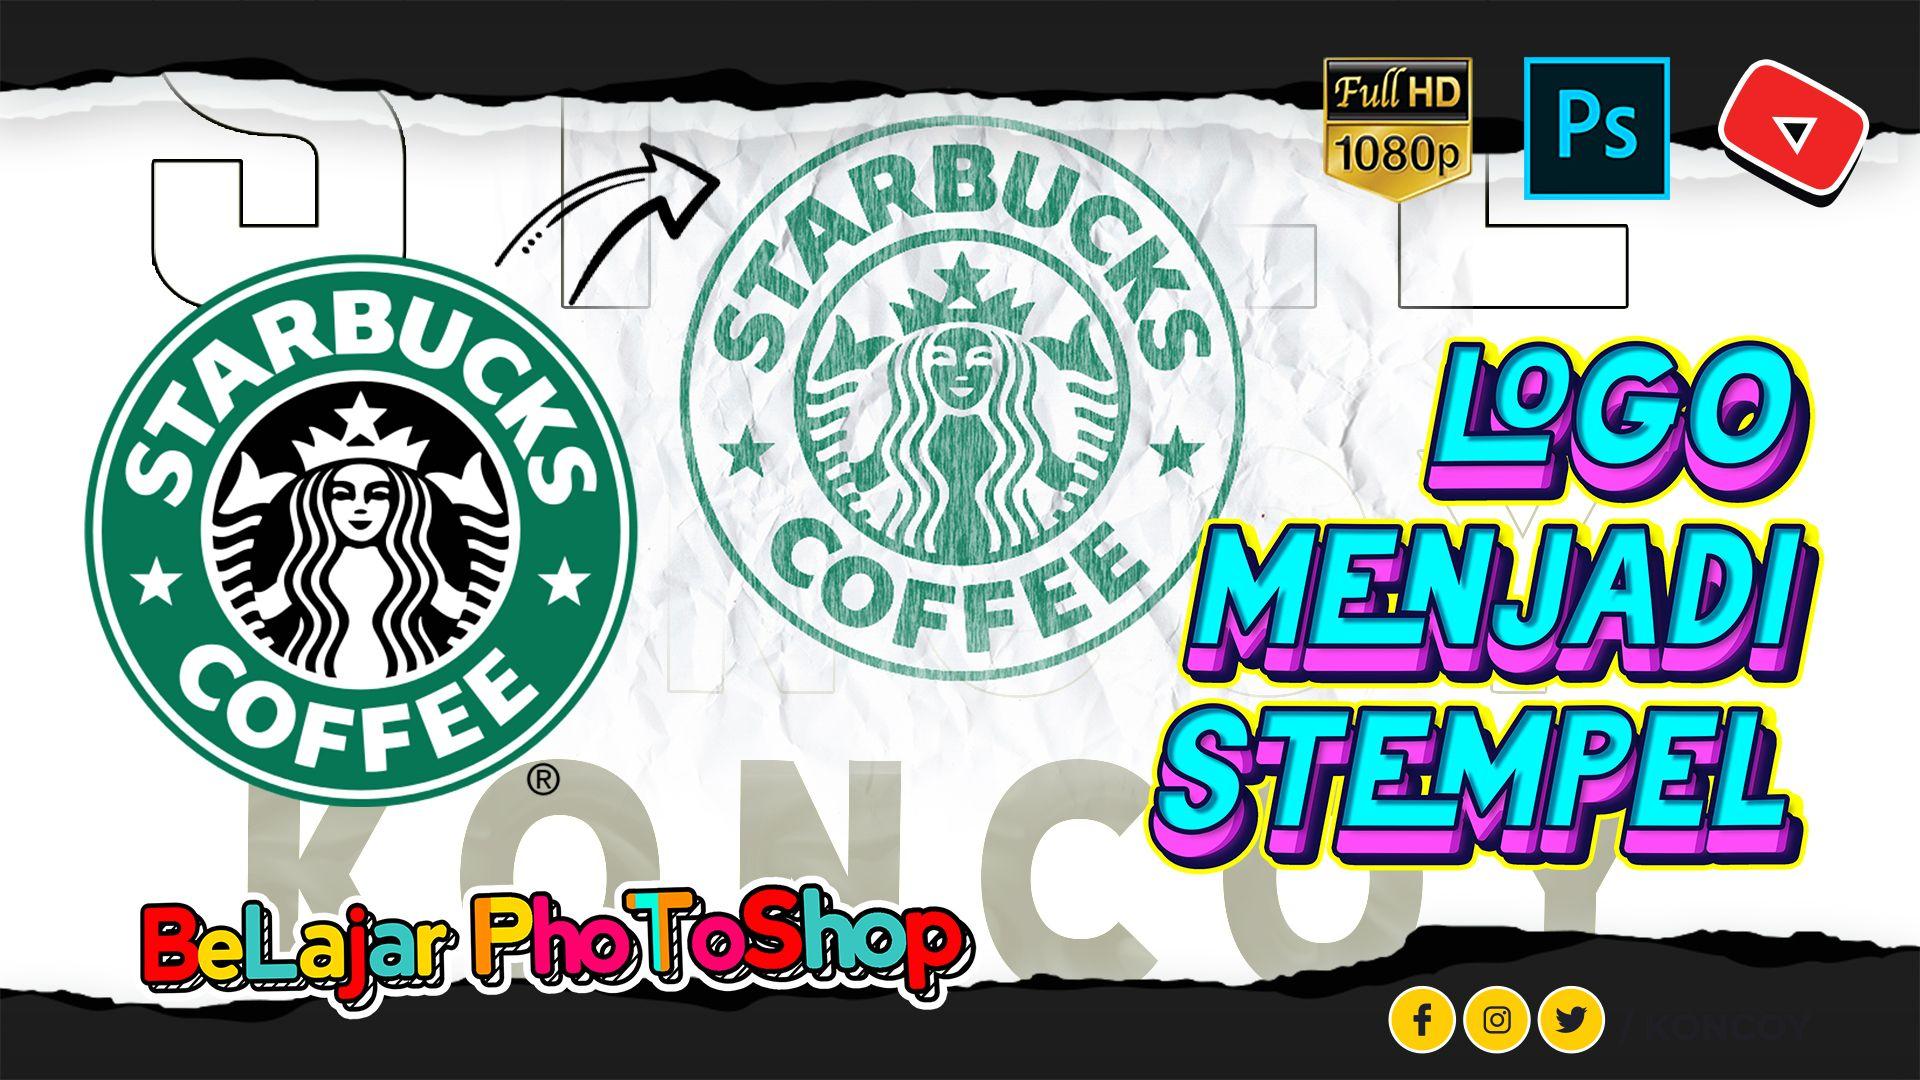 Cara Membuat Logo Menjadi Stempel Di Photoshop Cc 2021 Photoshop Warna Belajar